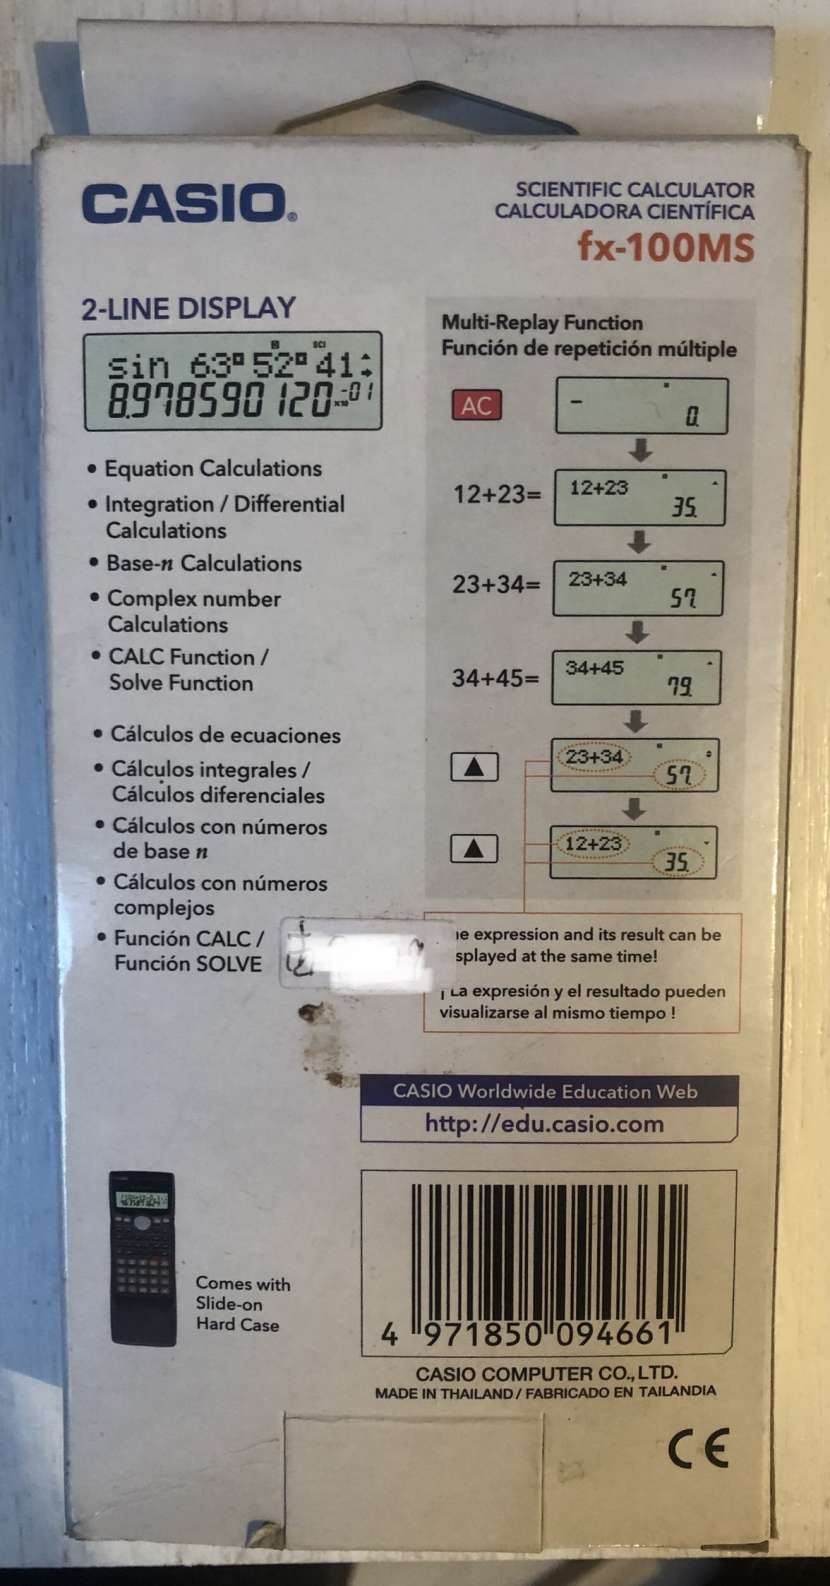 Calculadora Científica Casio FX-100MS - 1